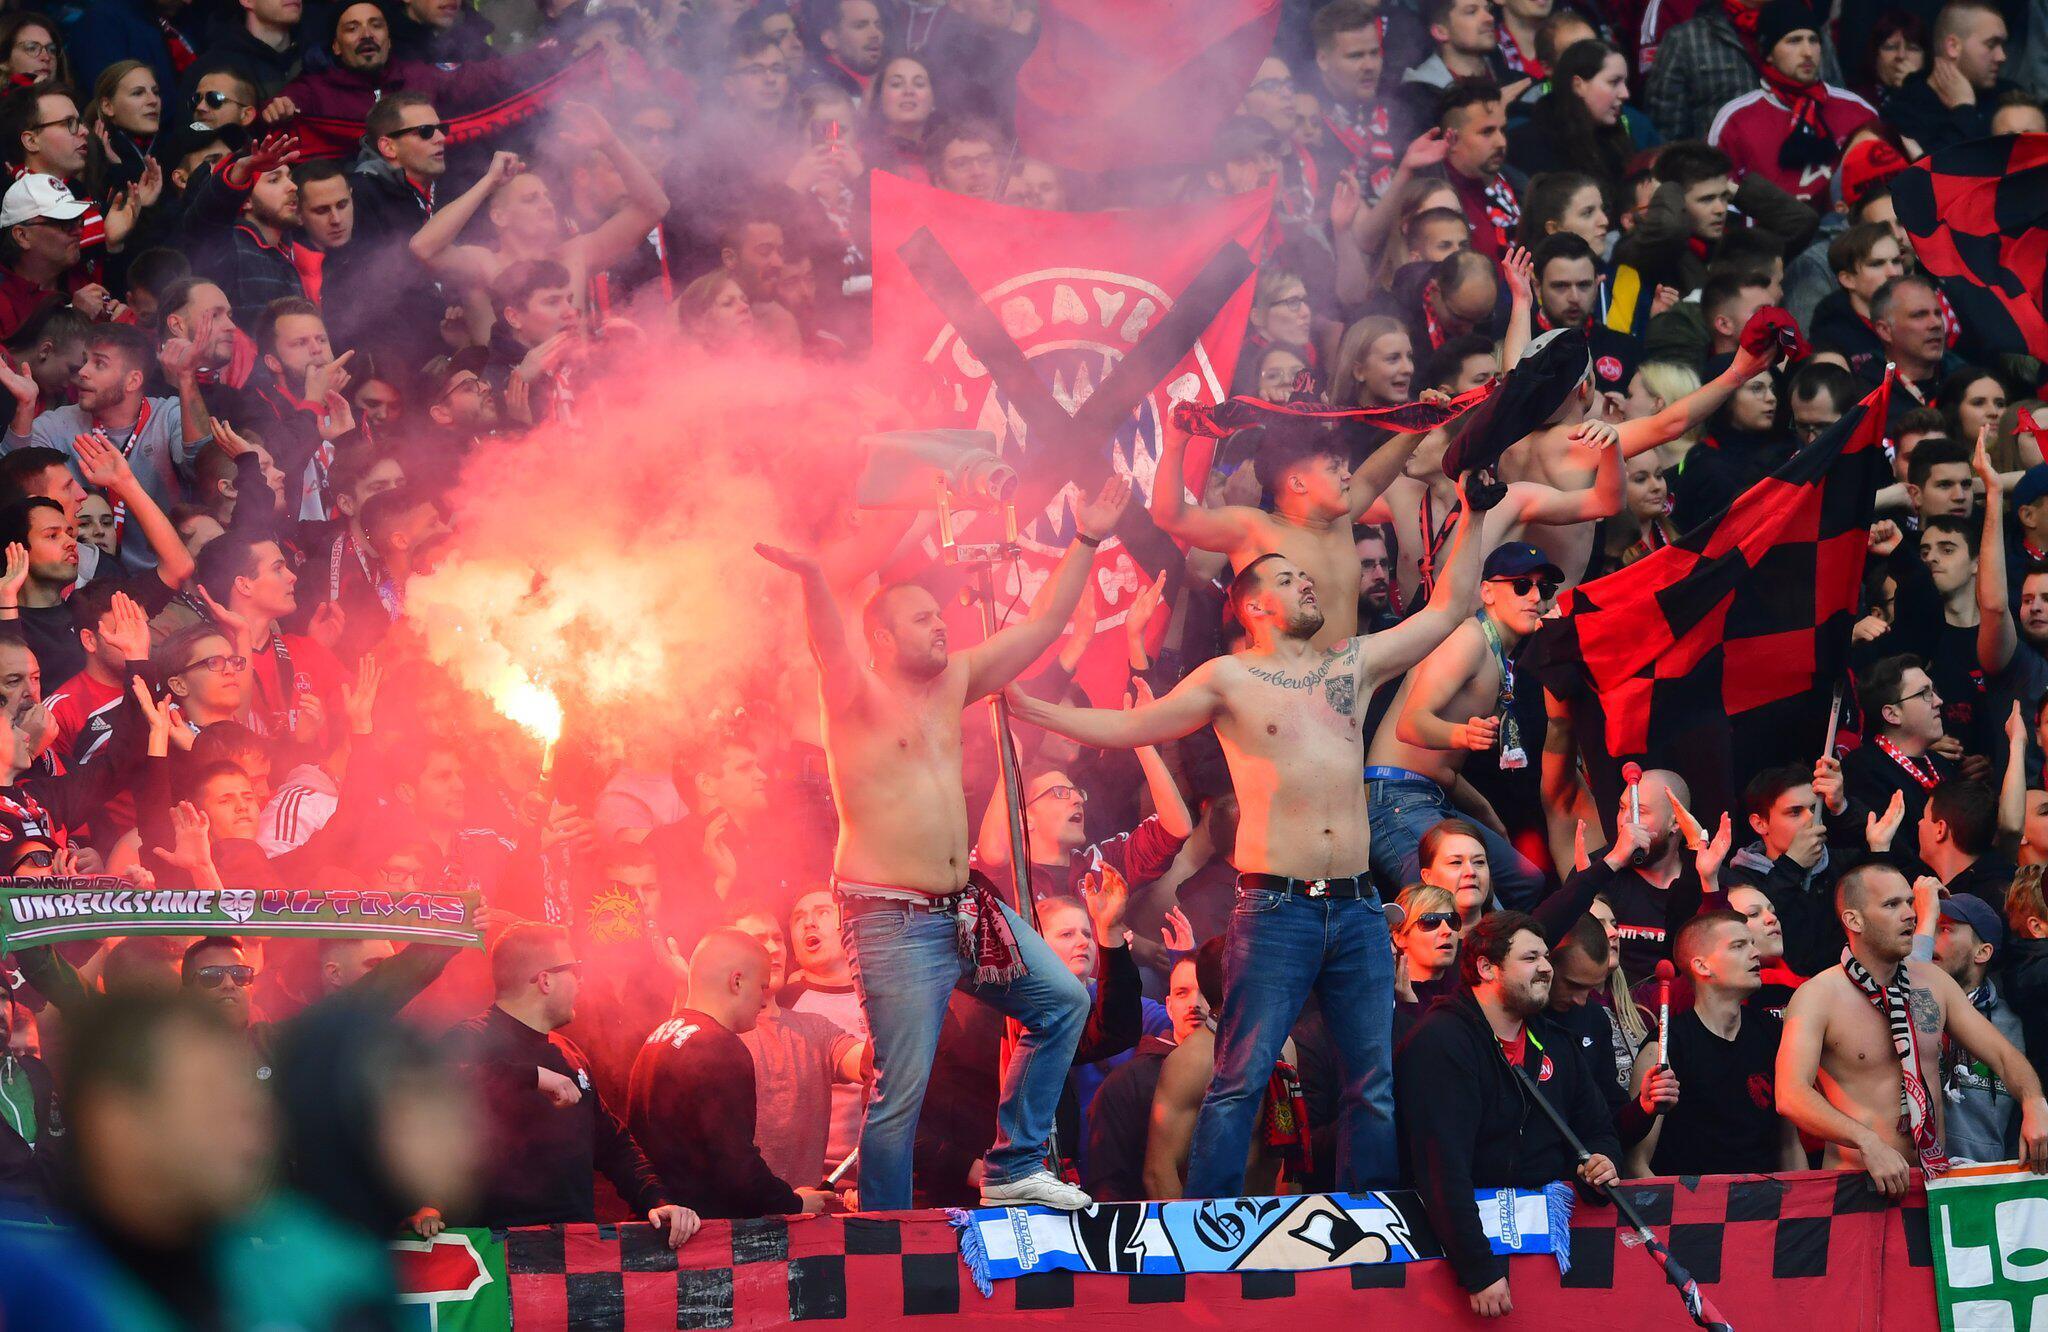 Bild zu 1. FC Nürnberg - Bayern München 1:1